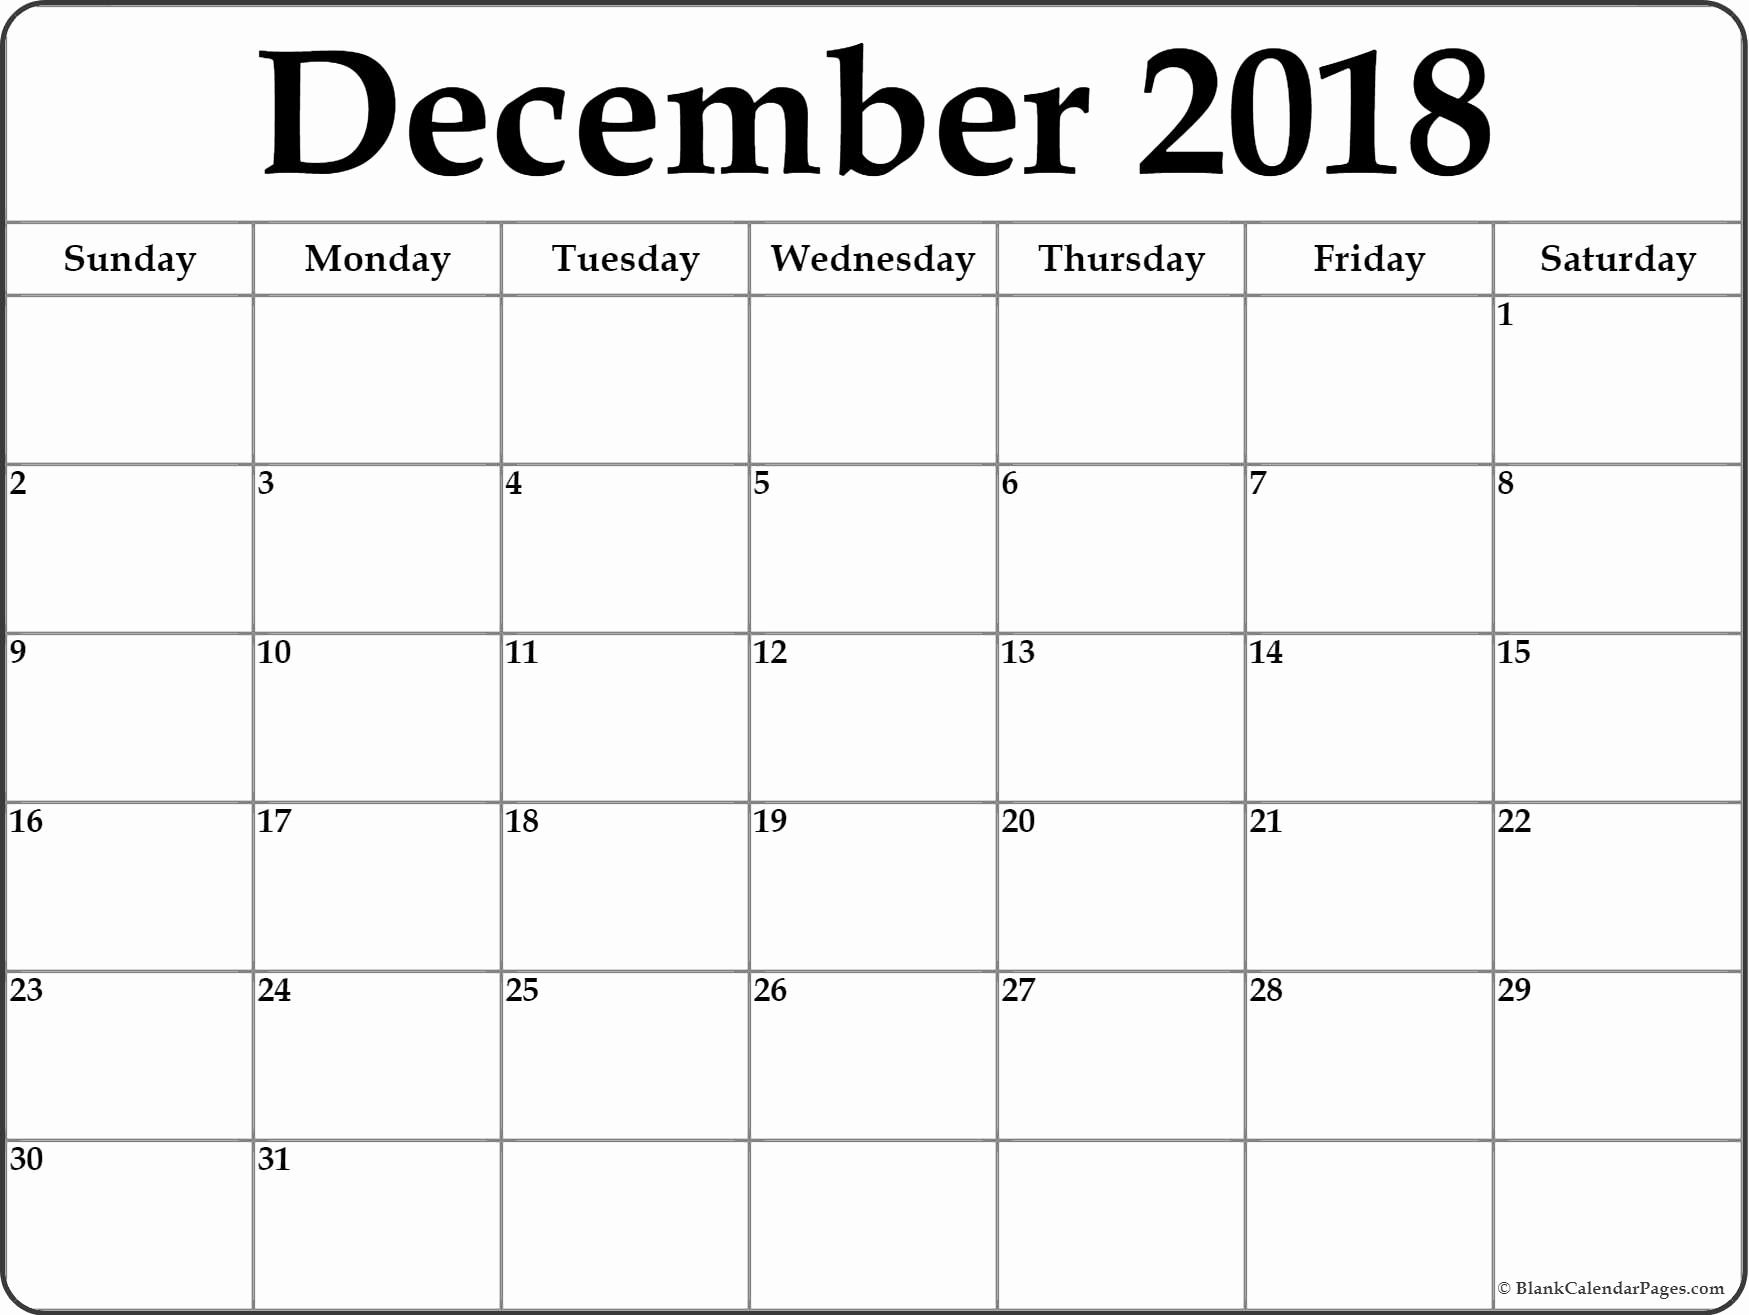 Calendar December 2018 And January 2019 | Blank Calendar